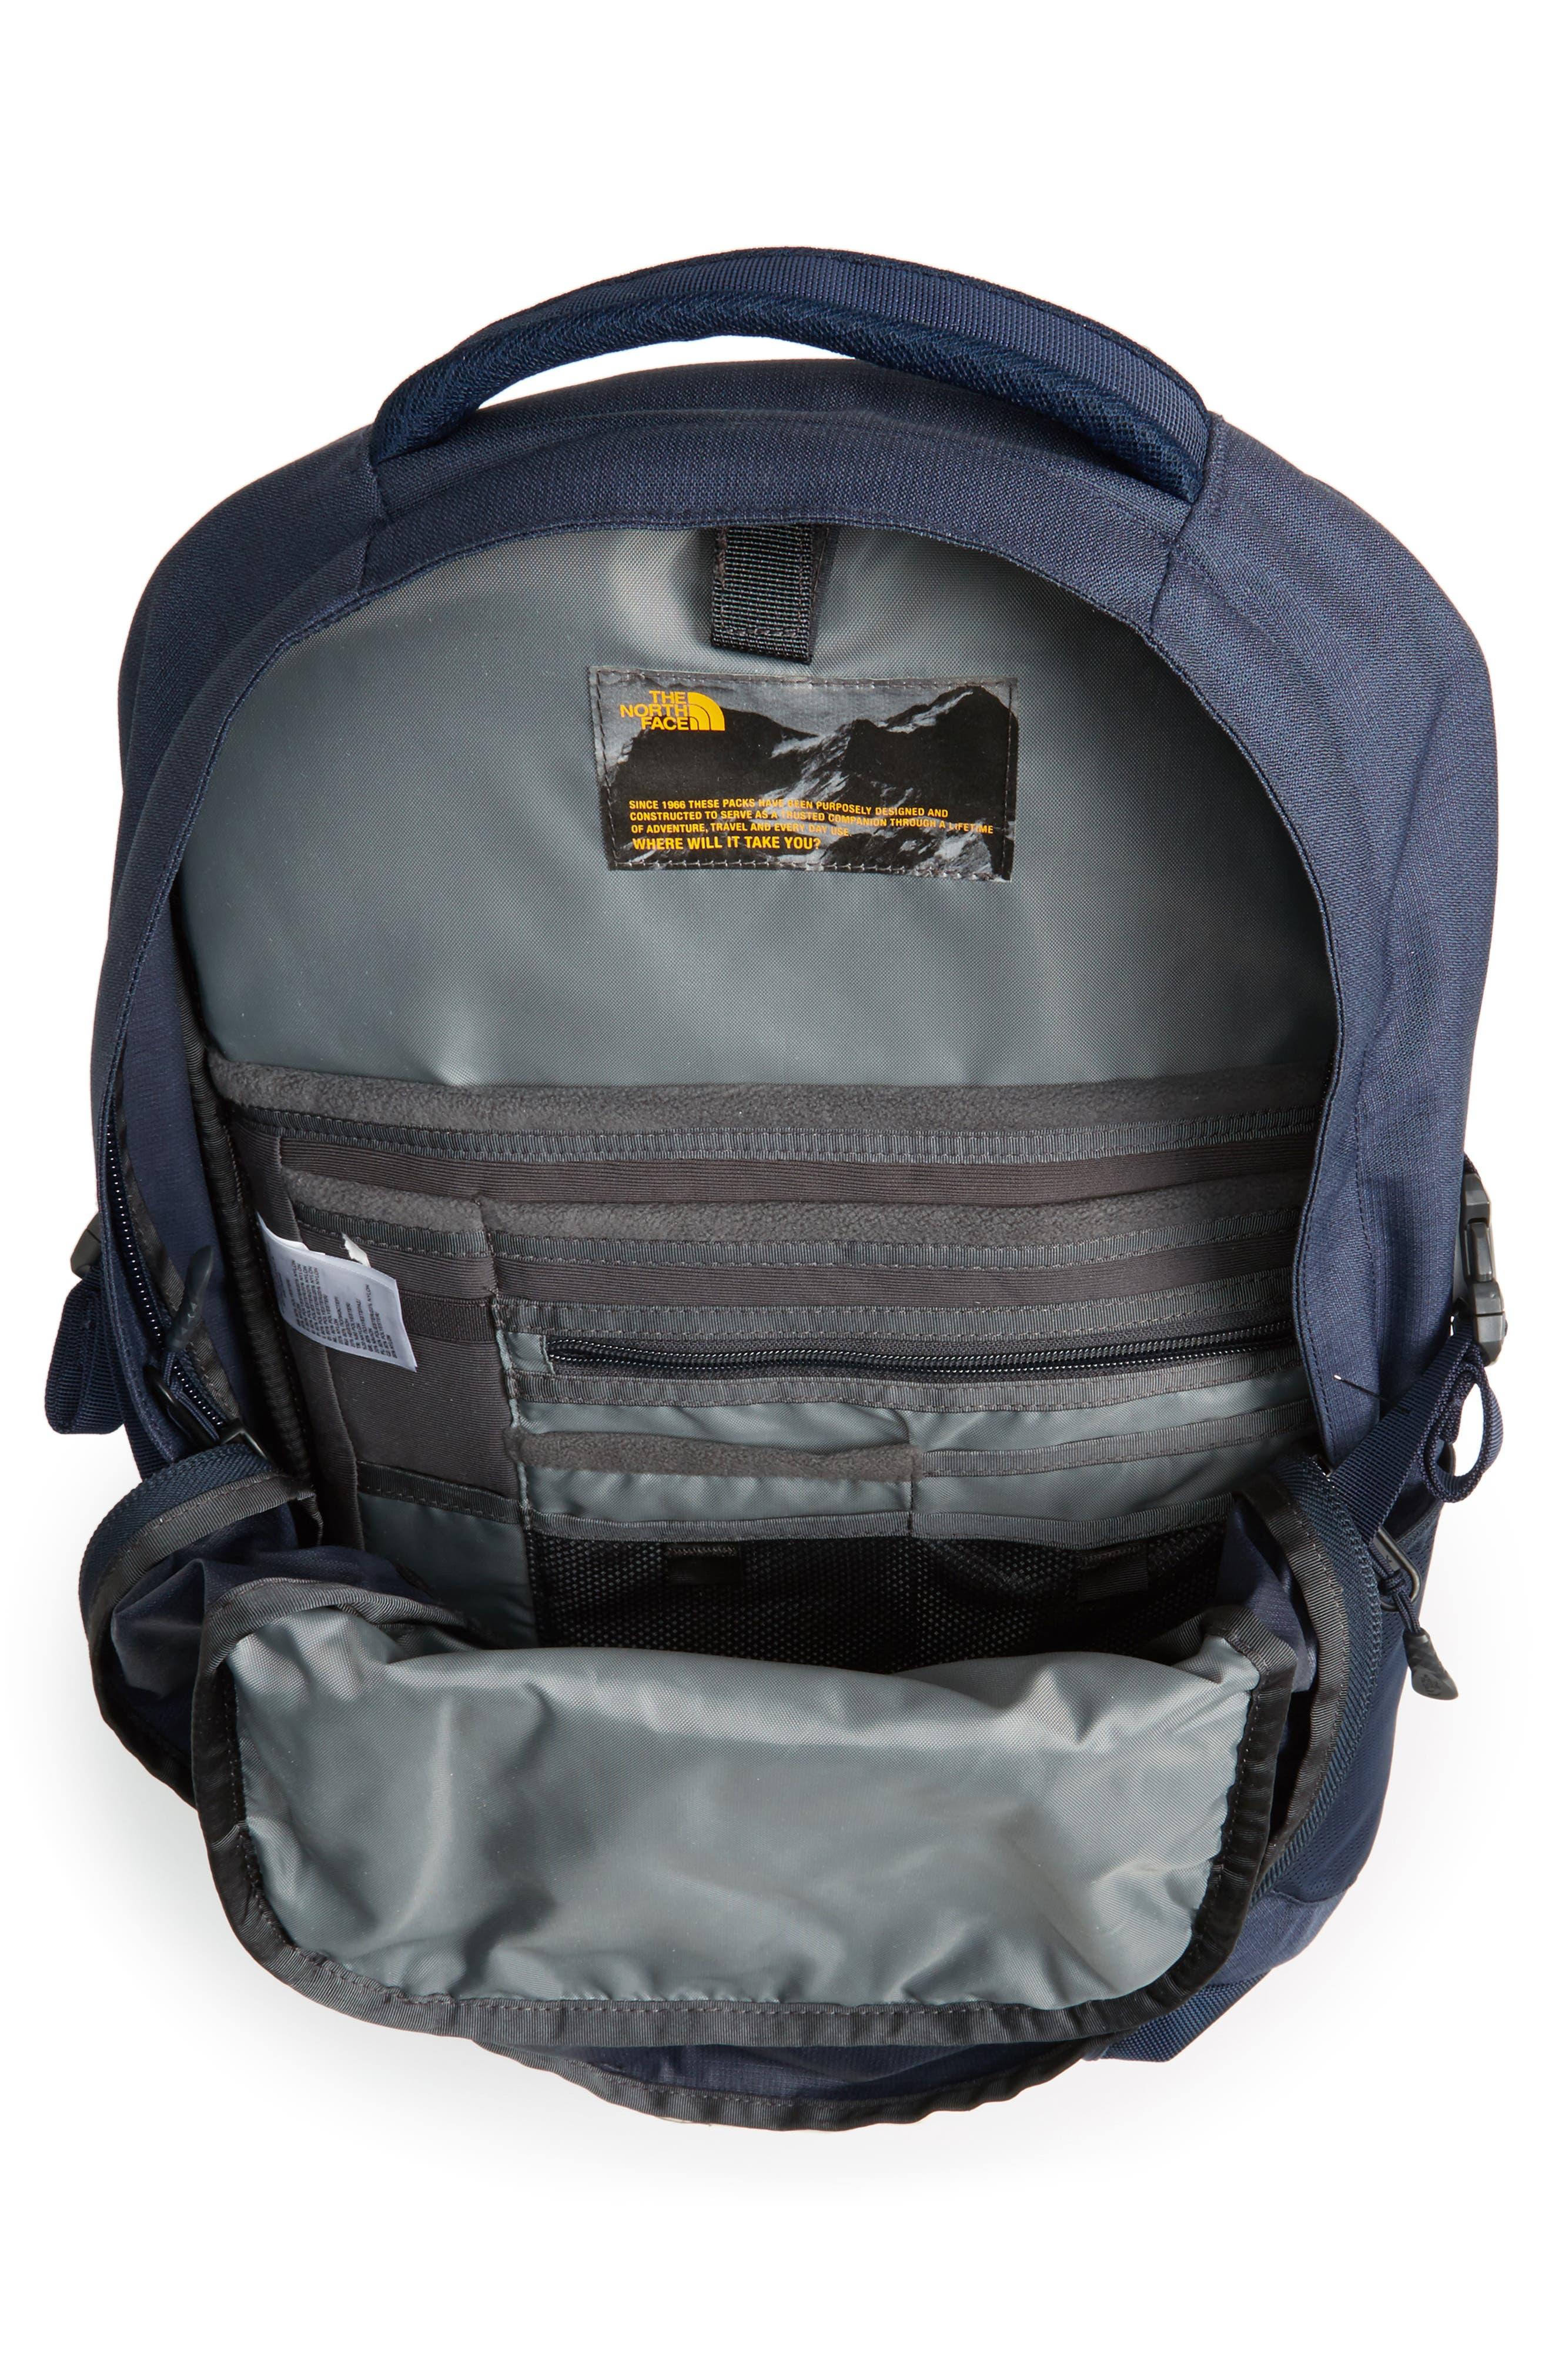 Iron Peak Backpack,                             Alternate thumbnail 15, color,